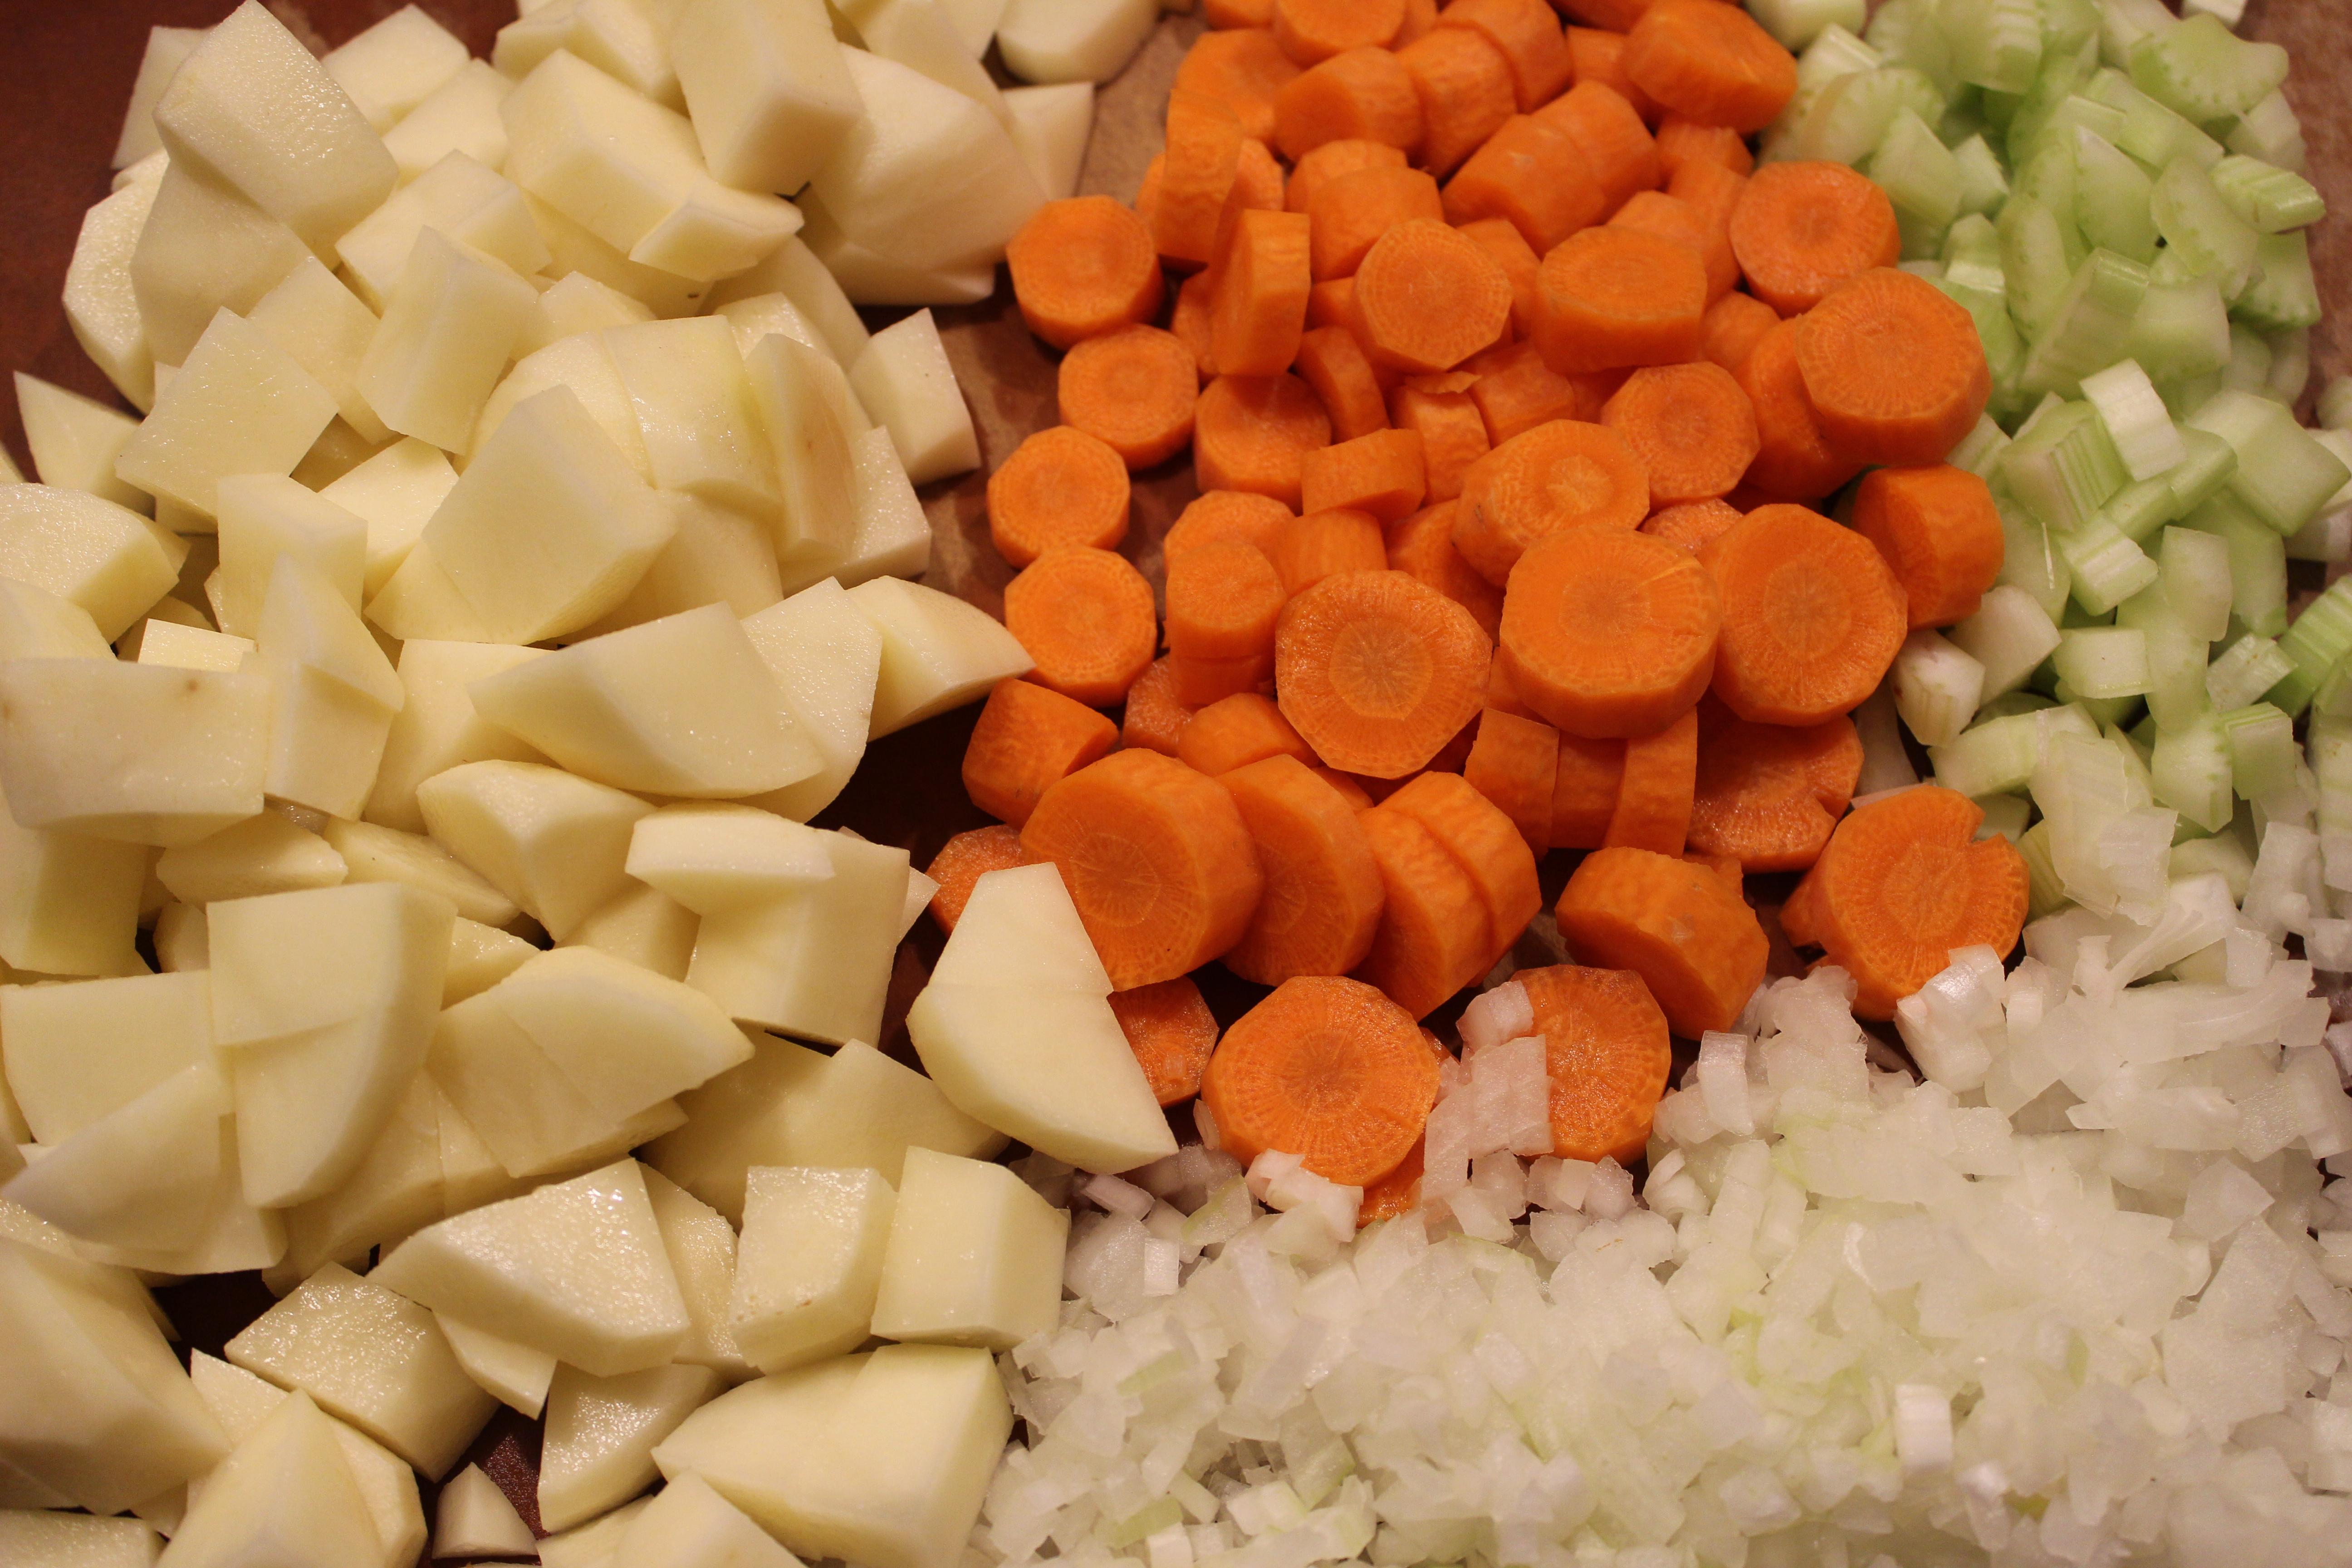 Ina Garten Broccoli baking soda – cooking at clark towers